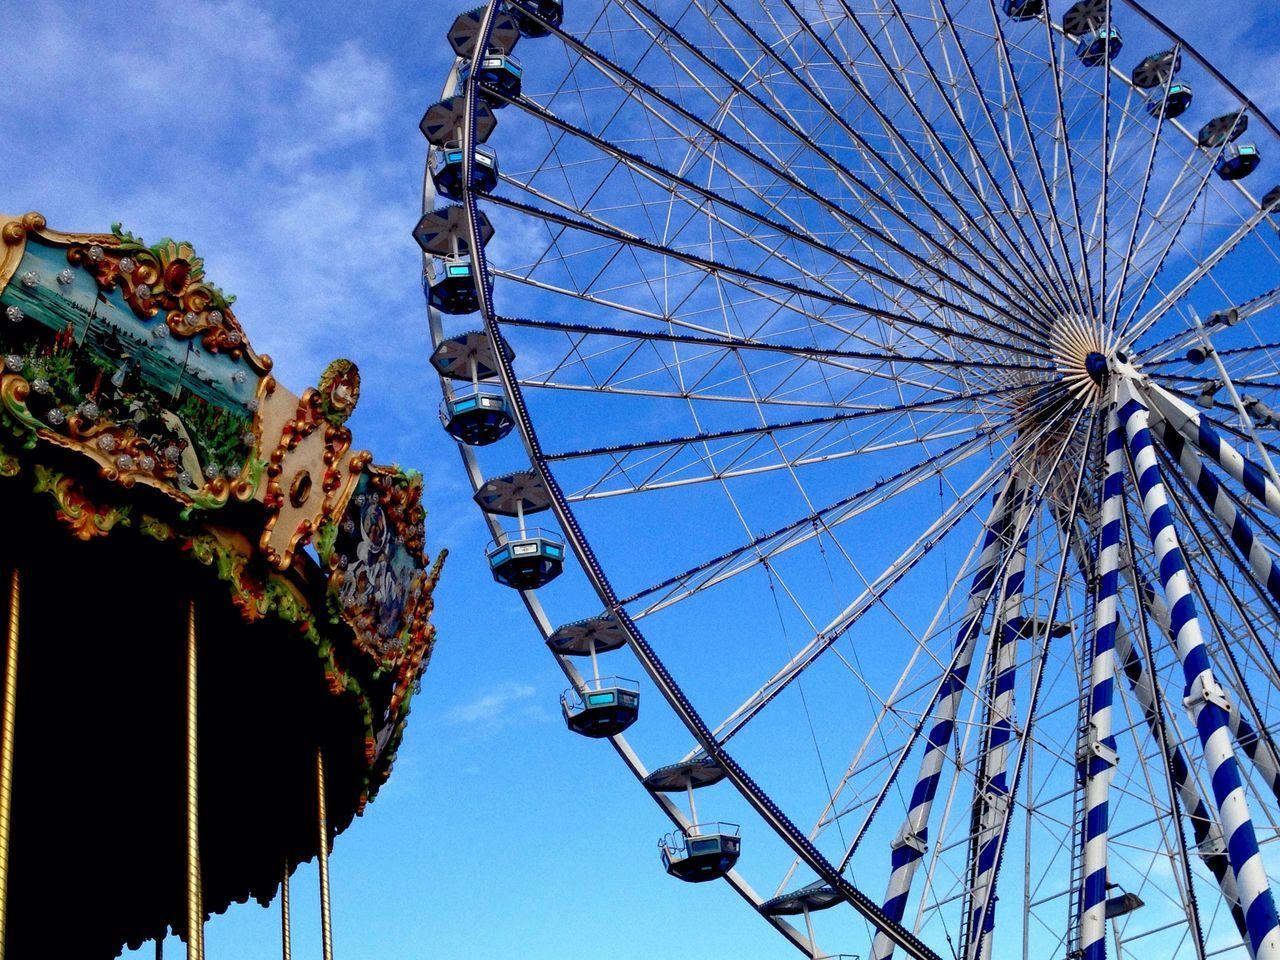 low angle view, amusement park, arts culture and entertainment, amusement park ride, no people, ferris wheel, sky, day, outdoors, blue, big wheel, built structure, clear sky, carousel